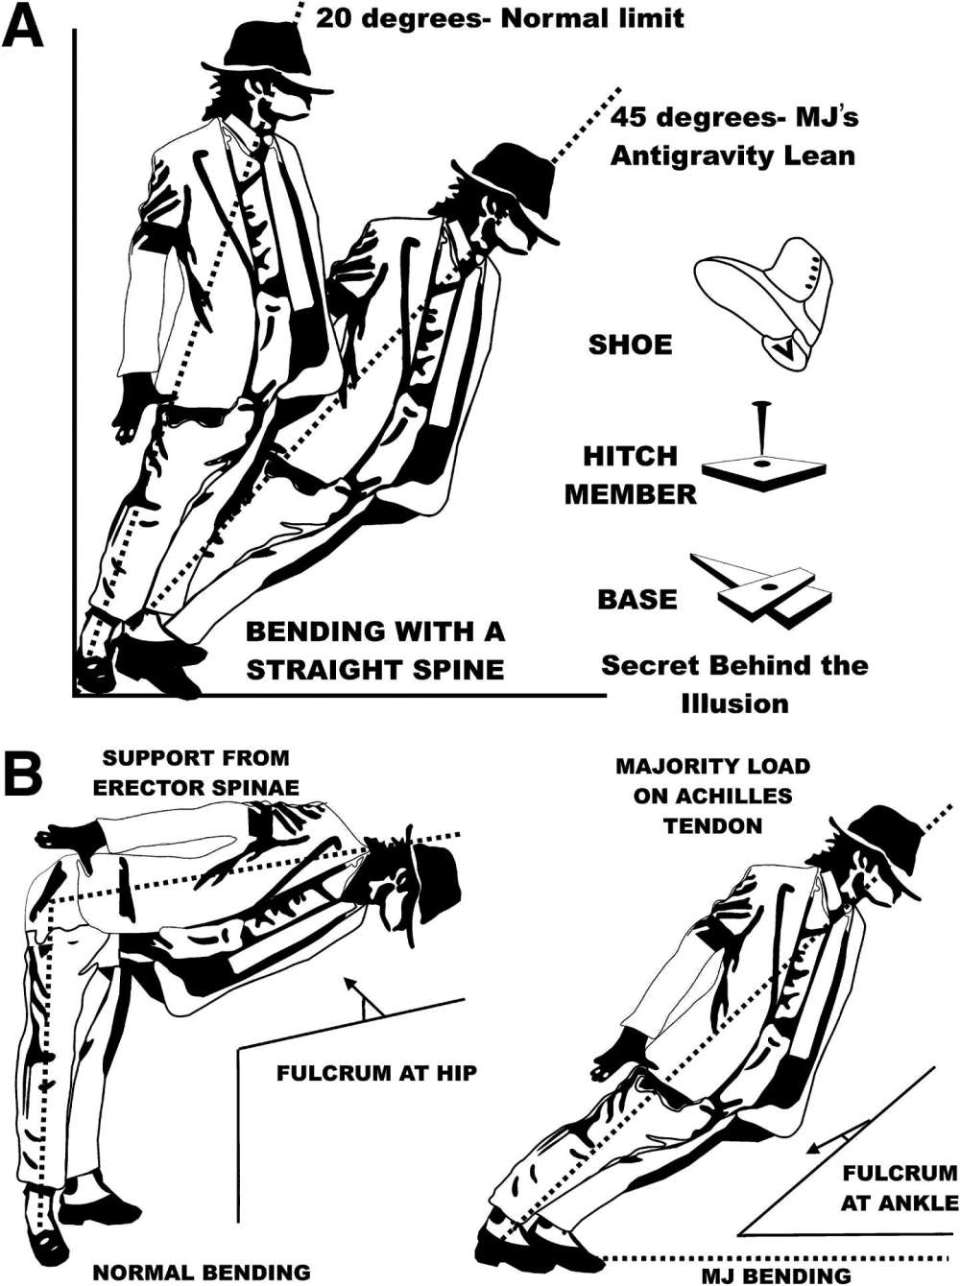 Michael Jackson And His Antigravity Tilt (1)